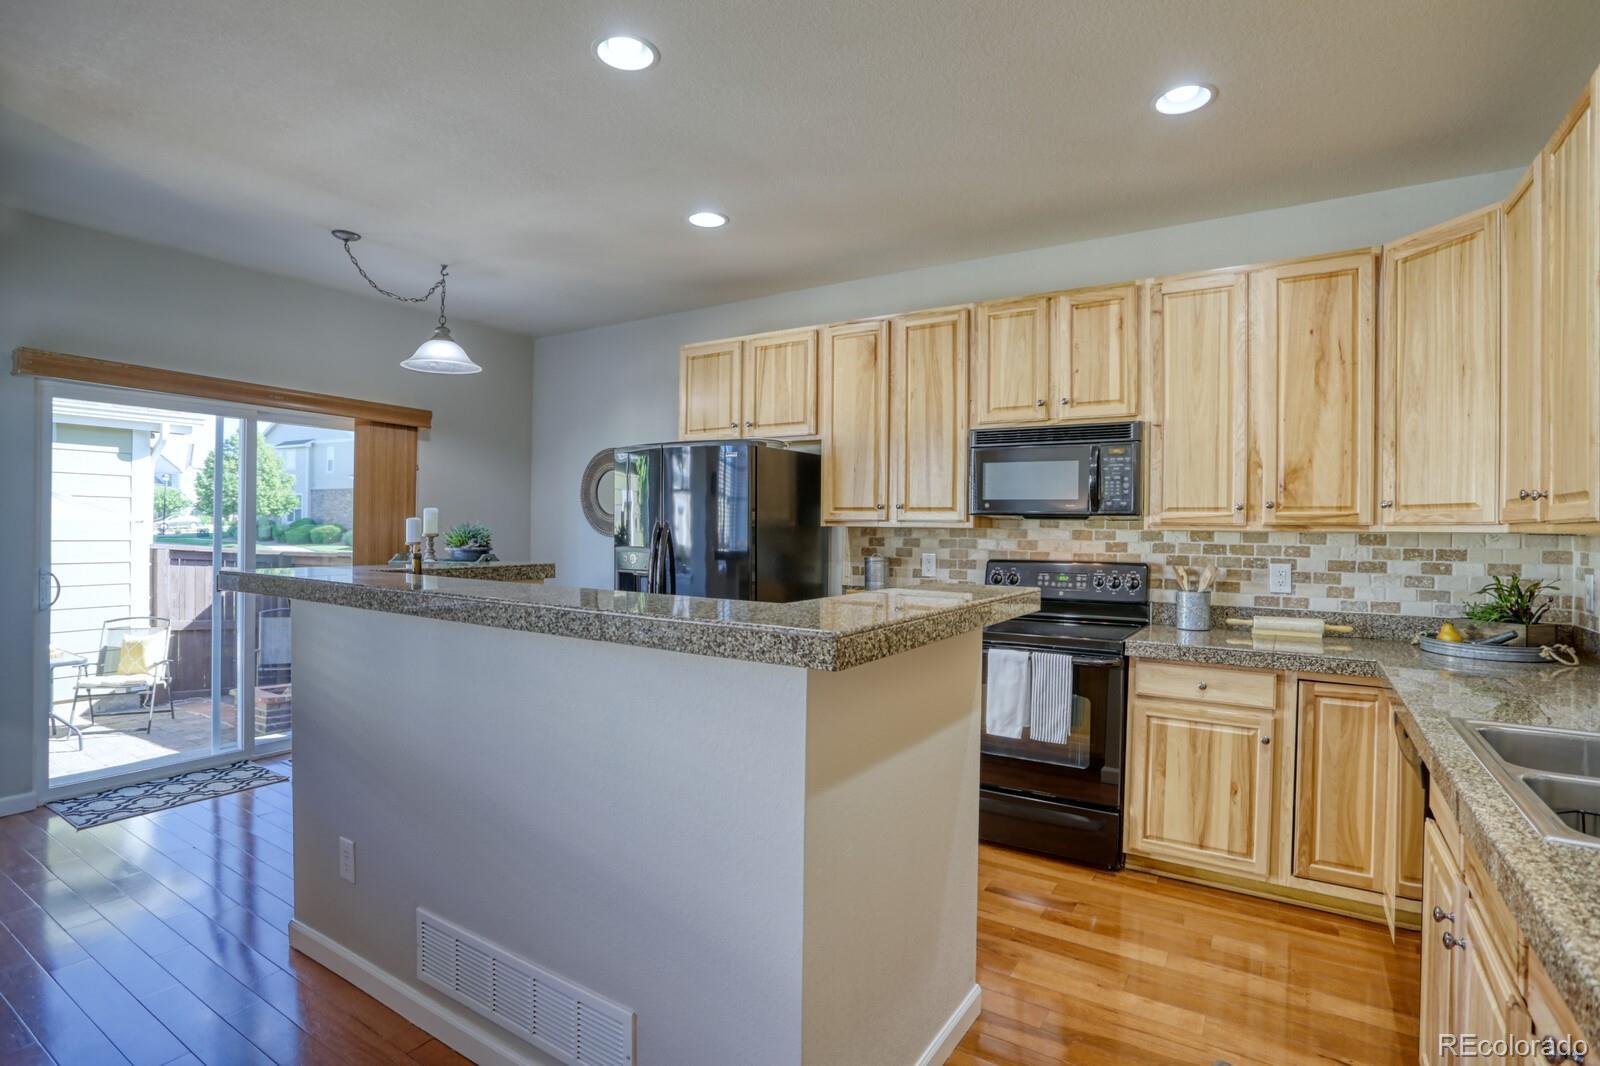 MLS# 8551789 - 12 - 22752 E Briarwood Place, Aurora, CO 80016